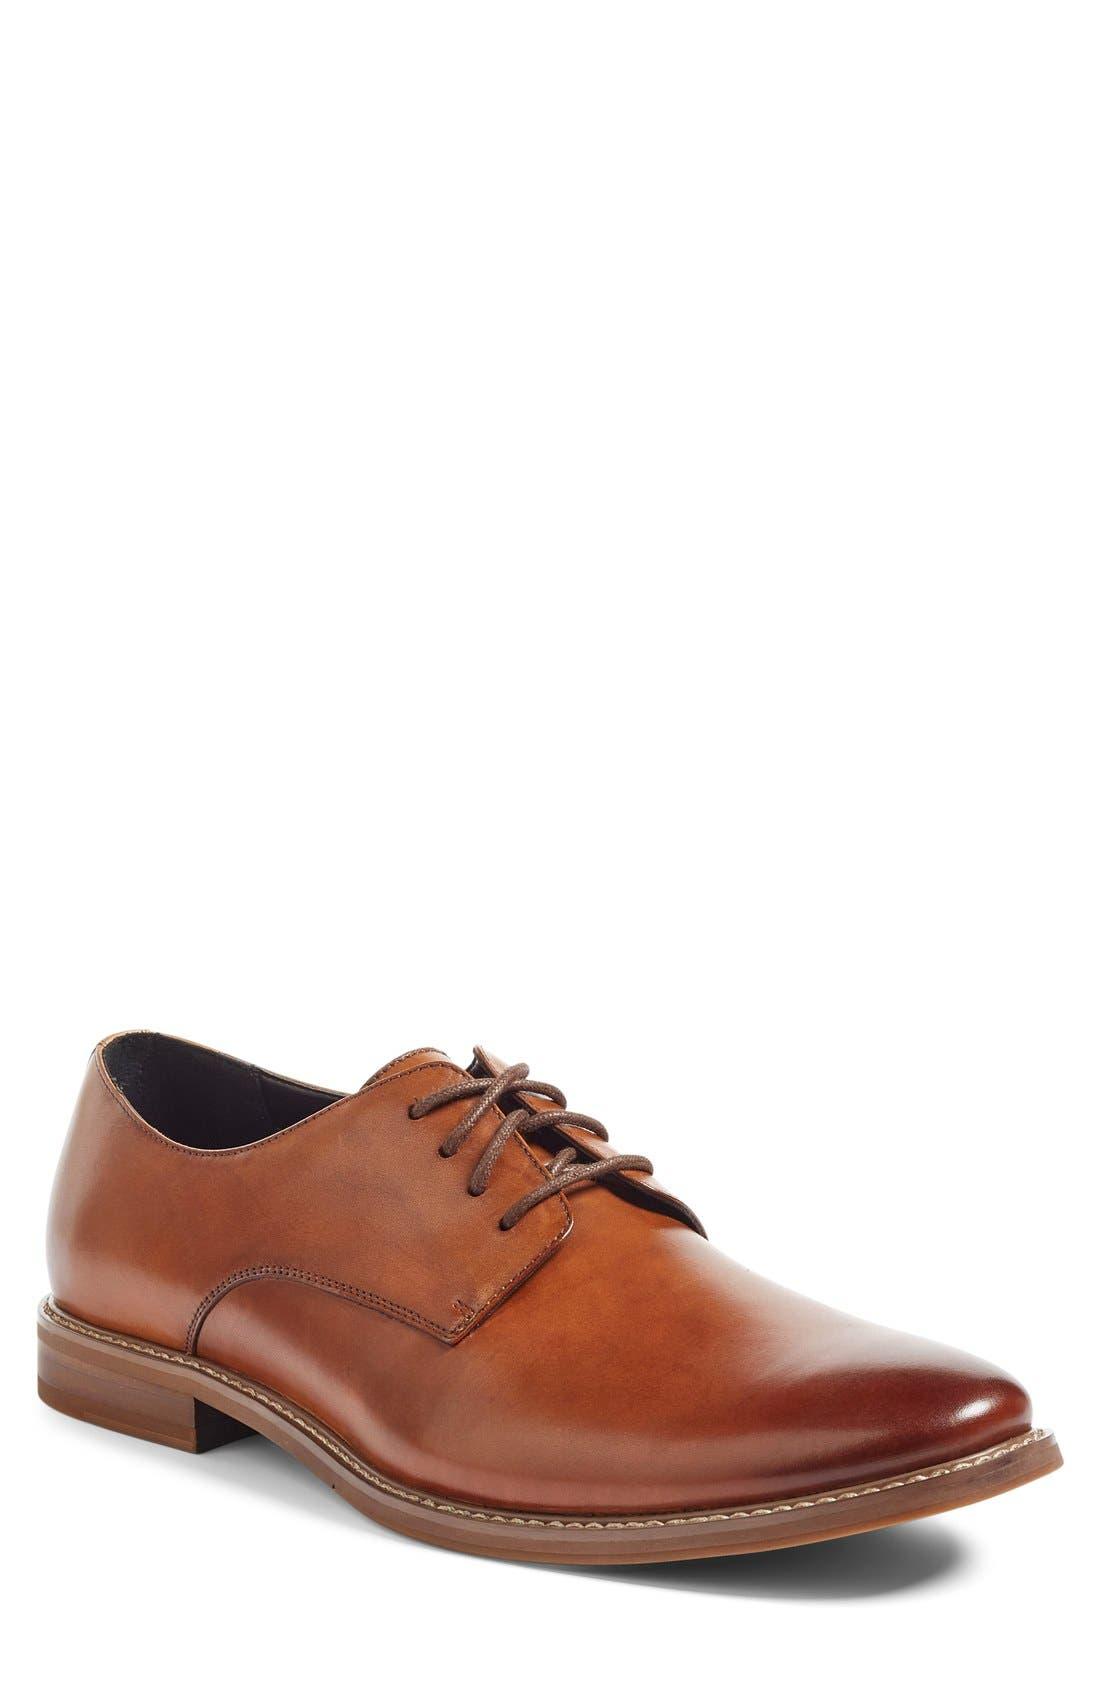 Everett Plain Toe Derby,                         Main,                         color, Tan Leather